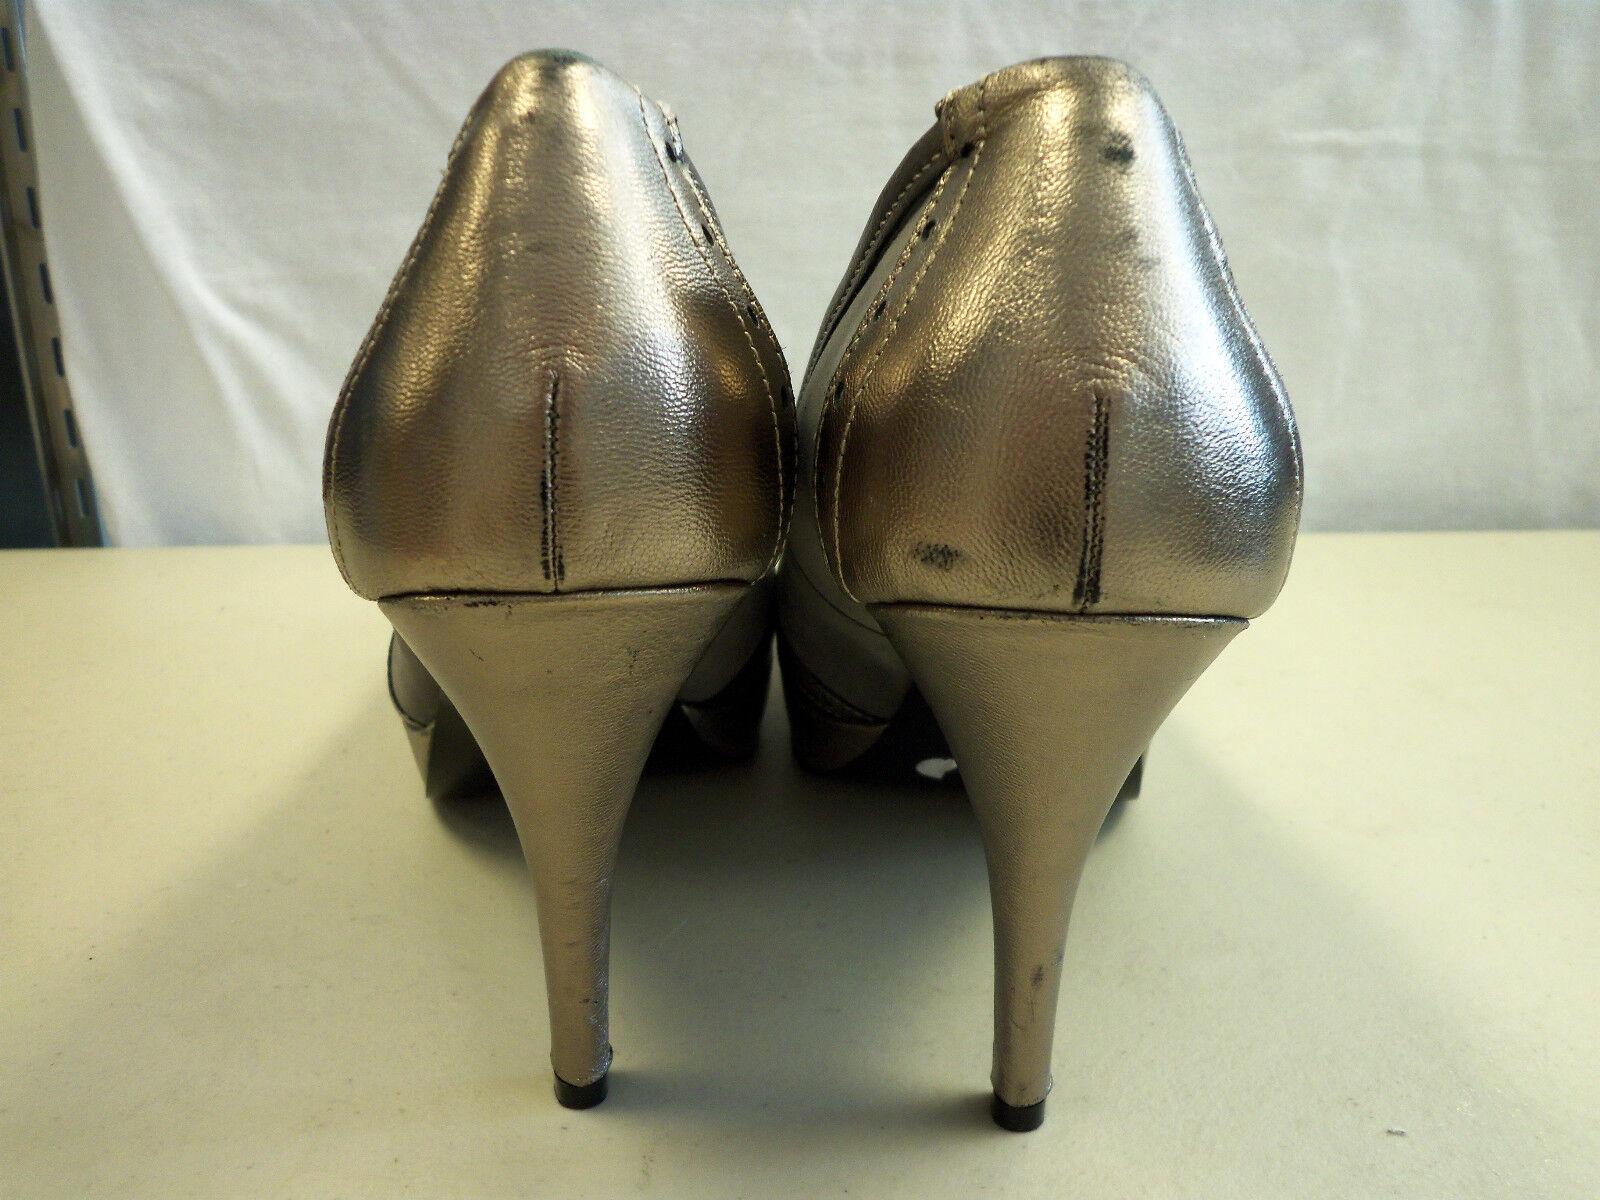 Nine West NEU Store Display Model Damenschuhe Celebm Platform Heels 9.5 M Schuhes